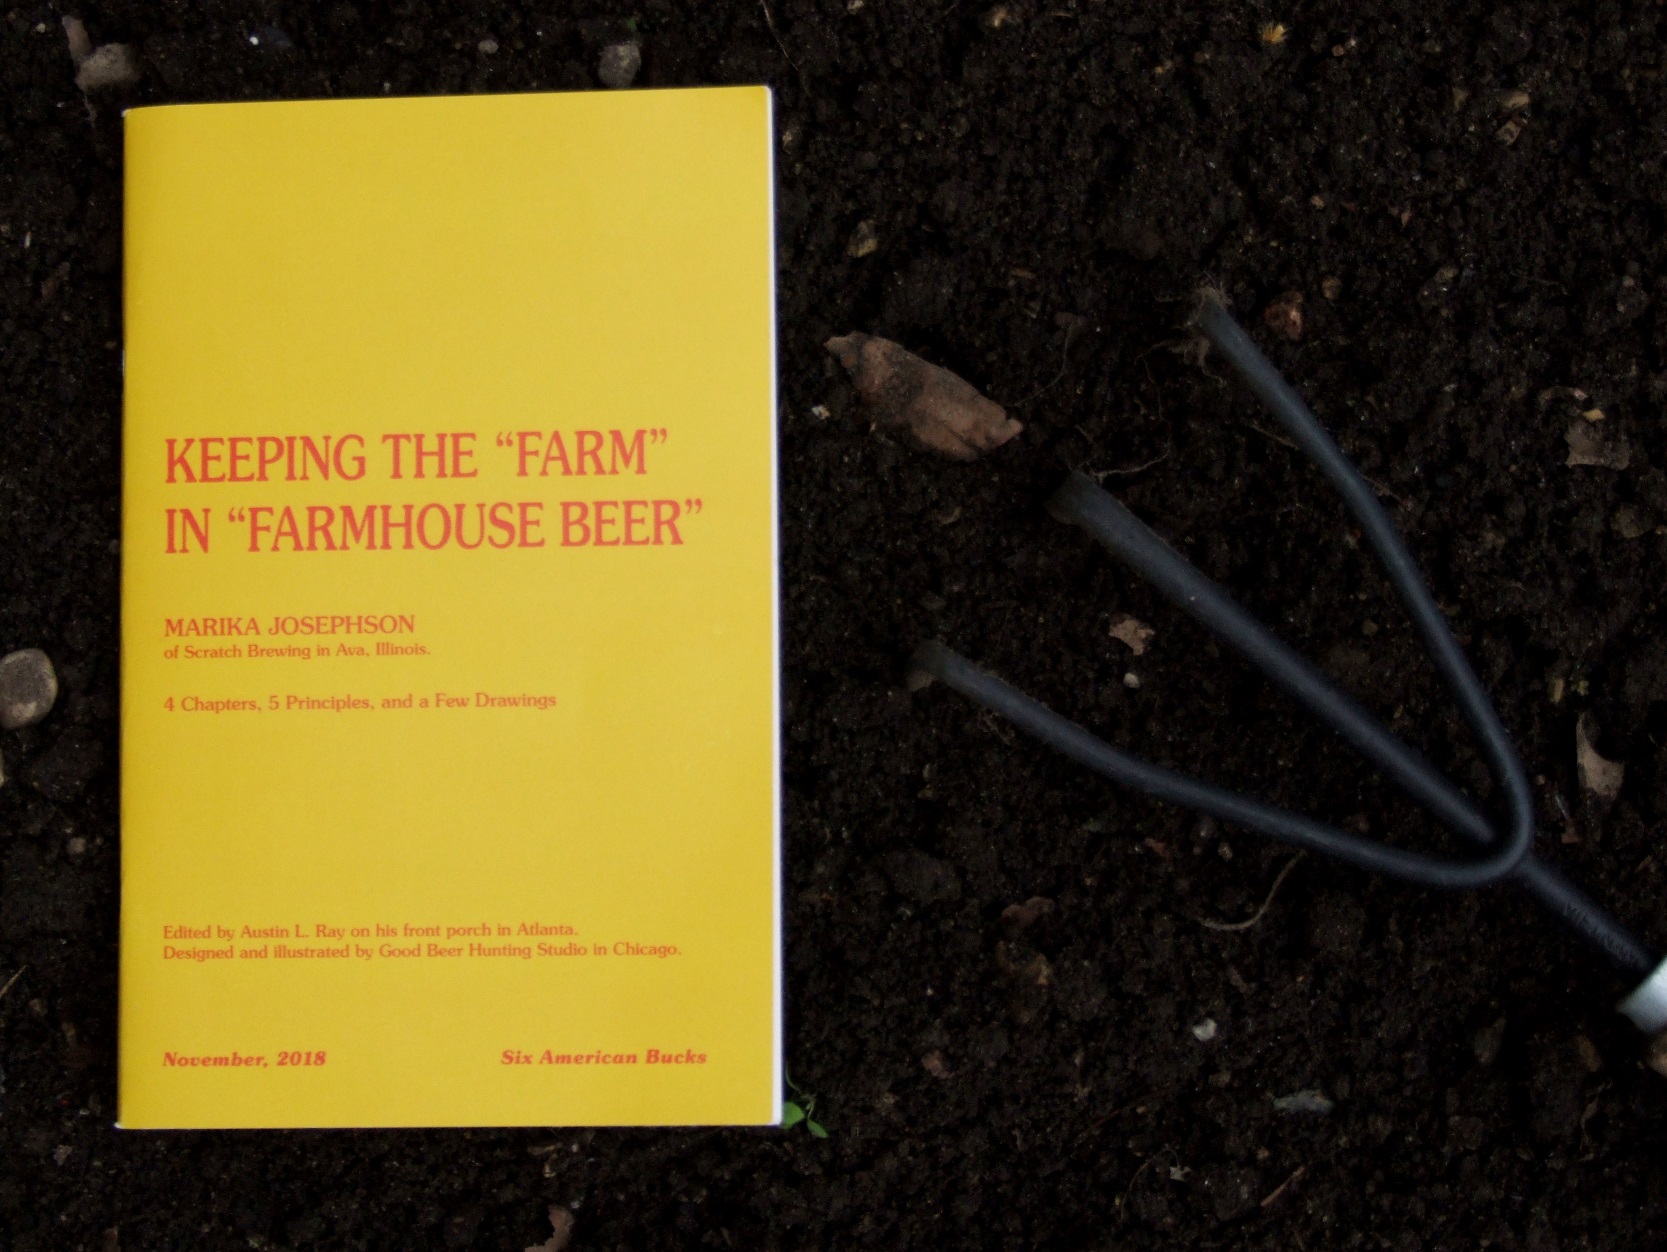 Book Review & Interview | Marika Josephson on Farmhouse Beer